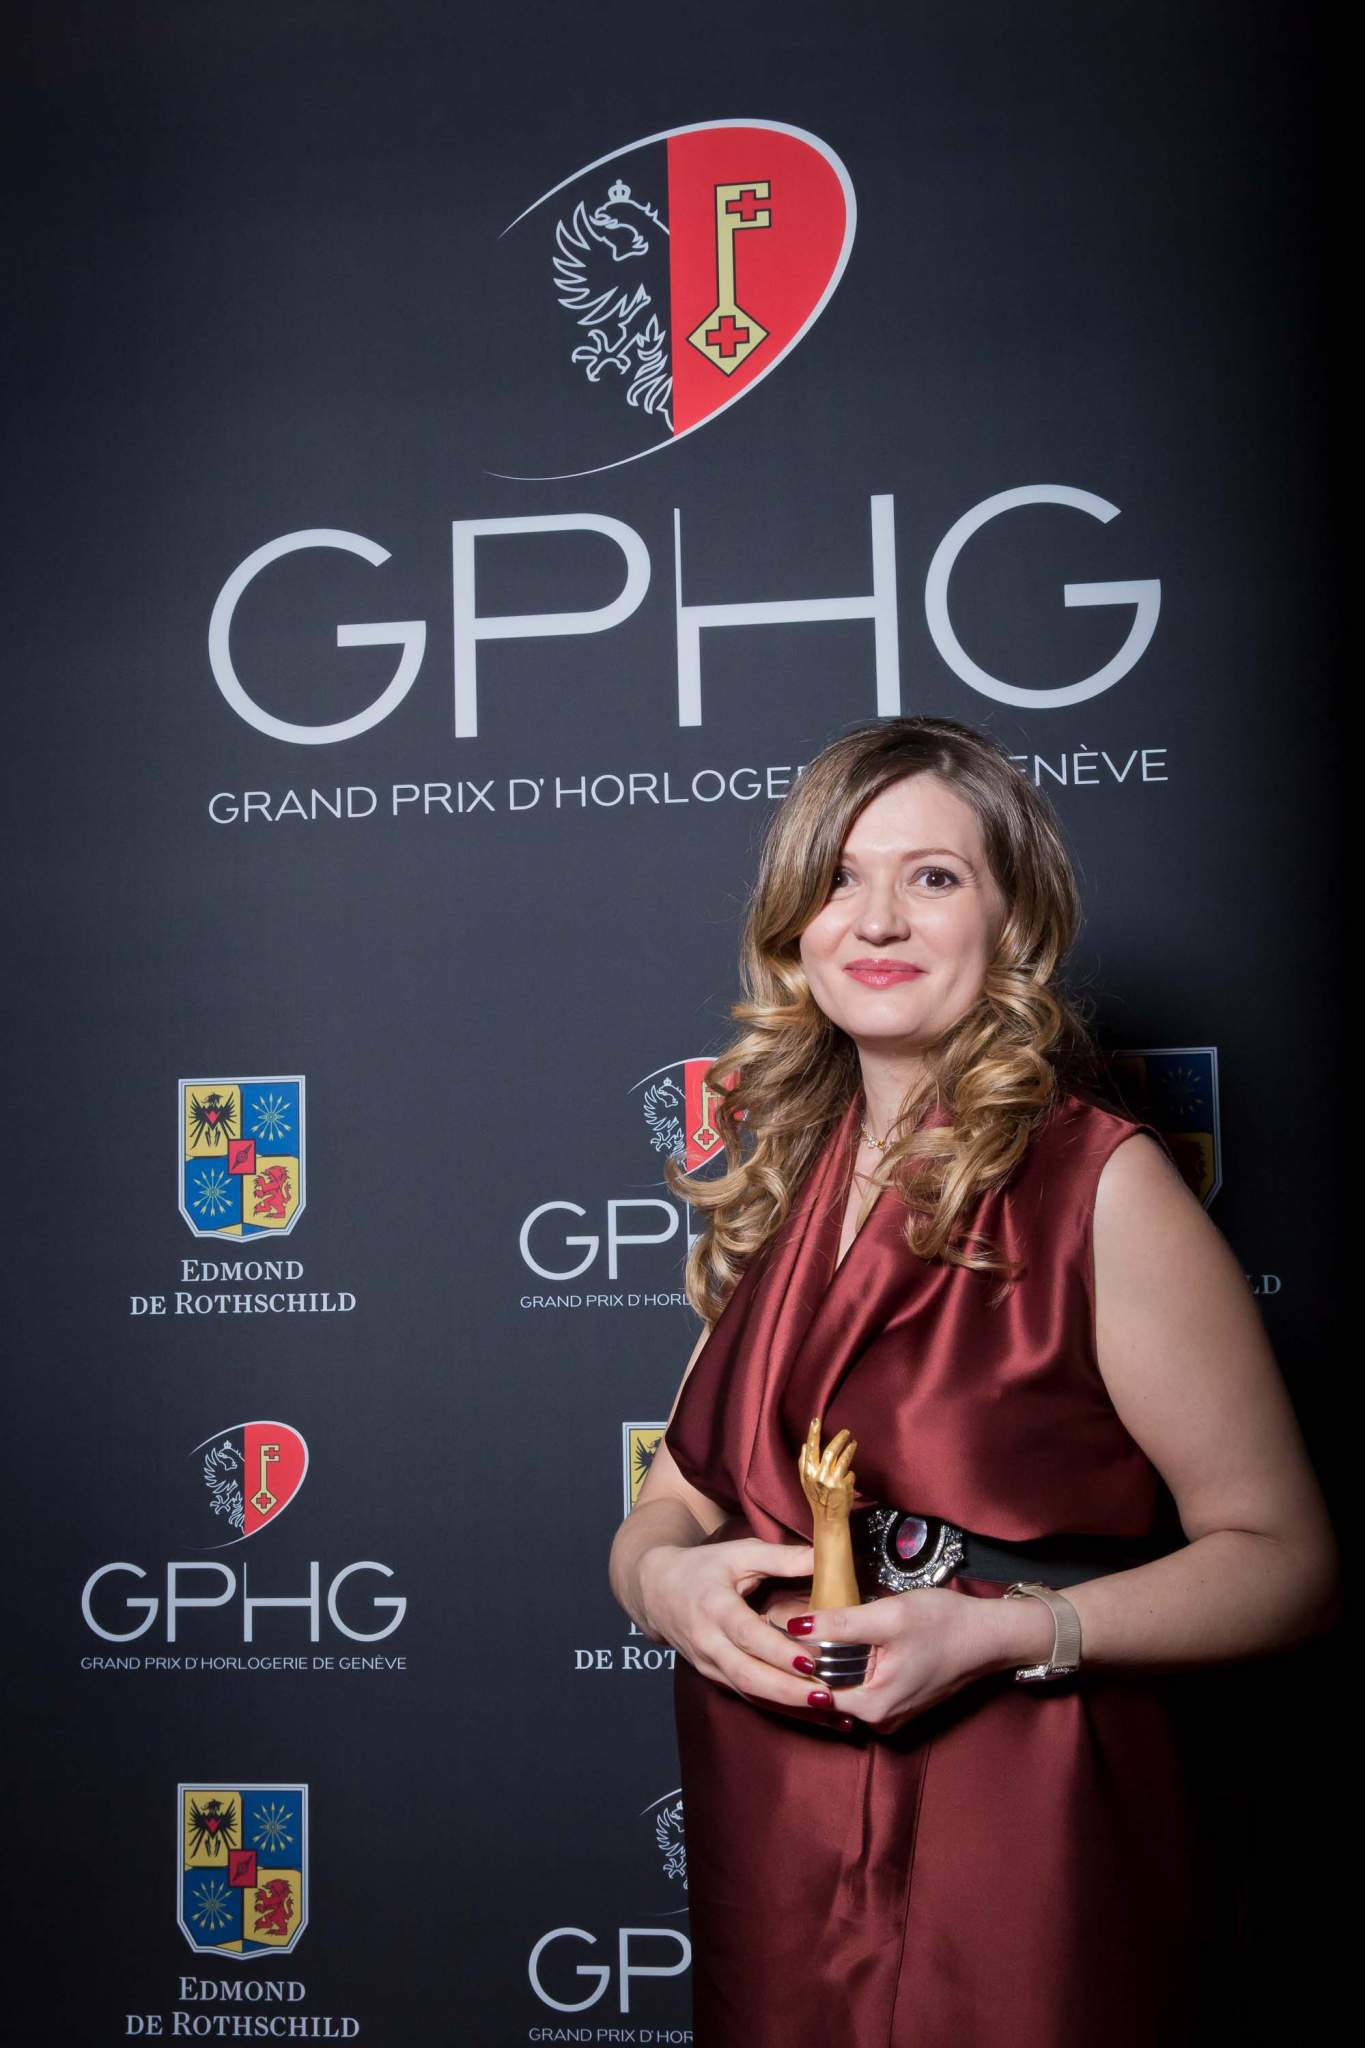 Brigitte Morina, CEO of DeLaneau, winner of the Ladies' Watch Prize 2013